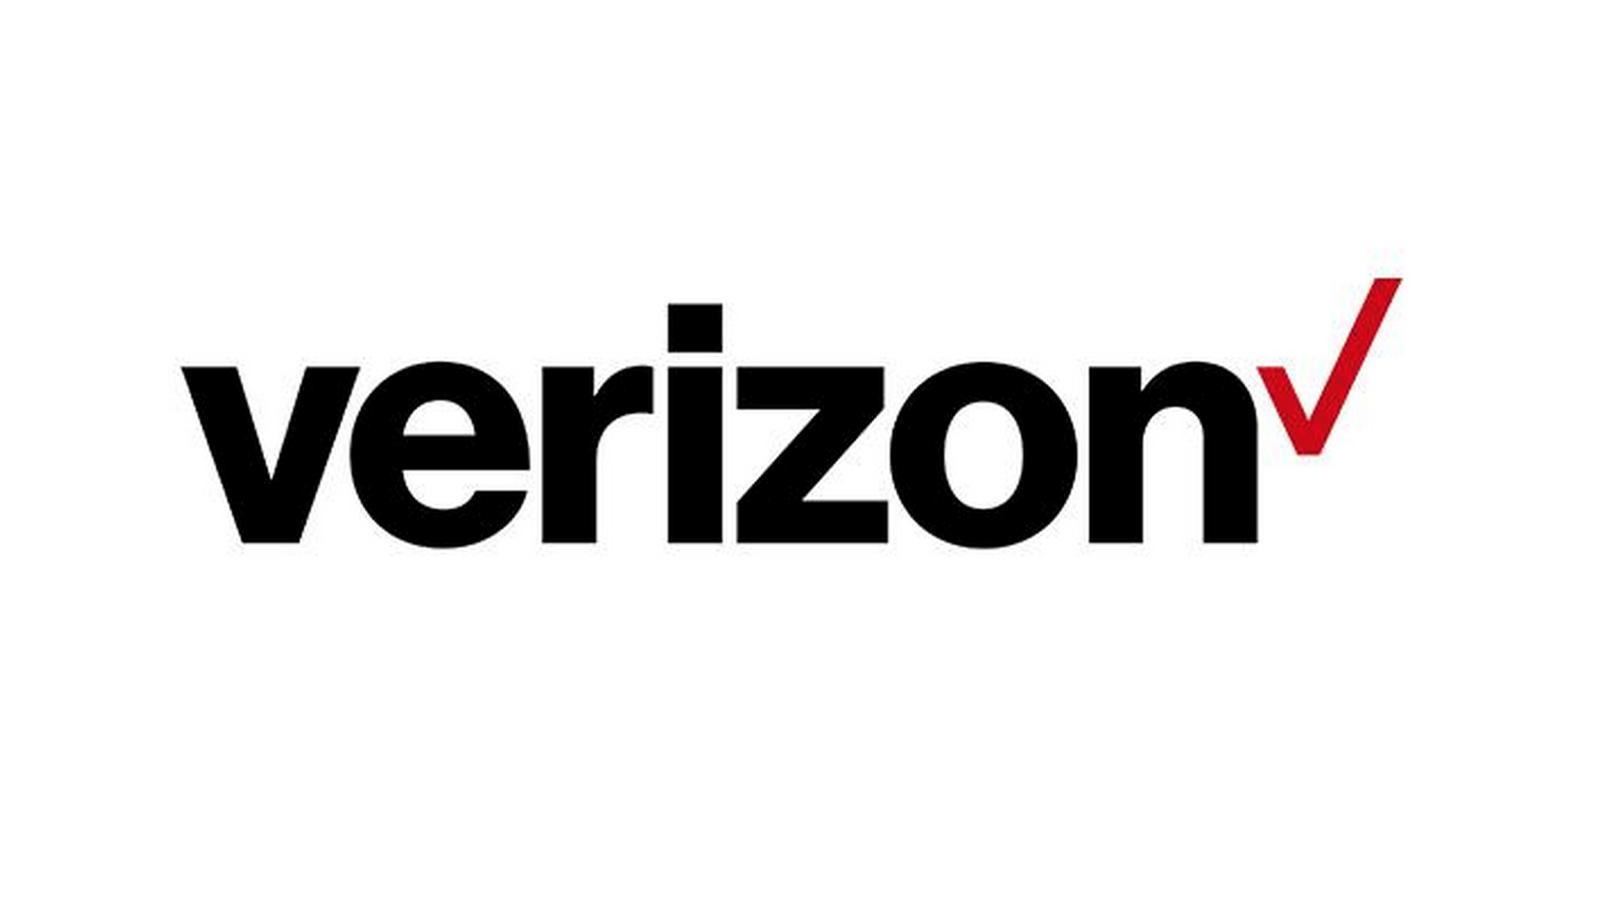 Verizon logo.png